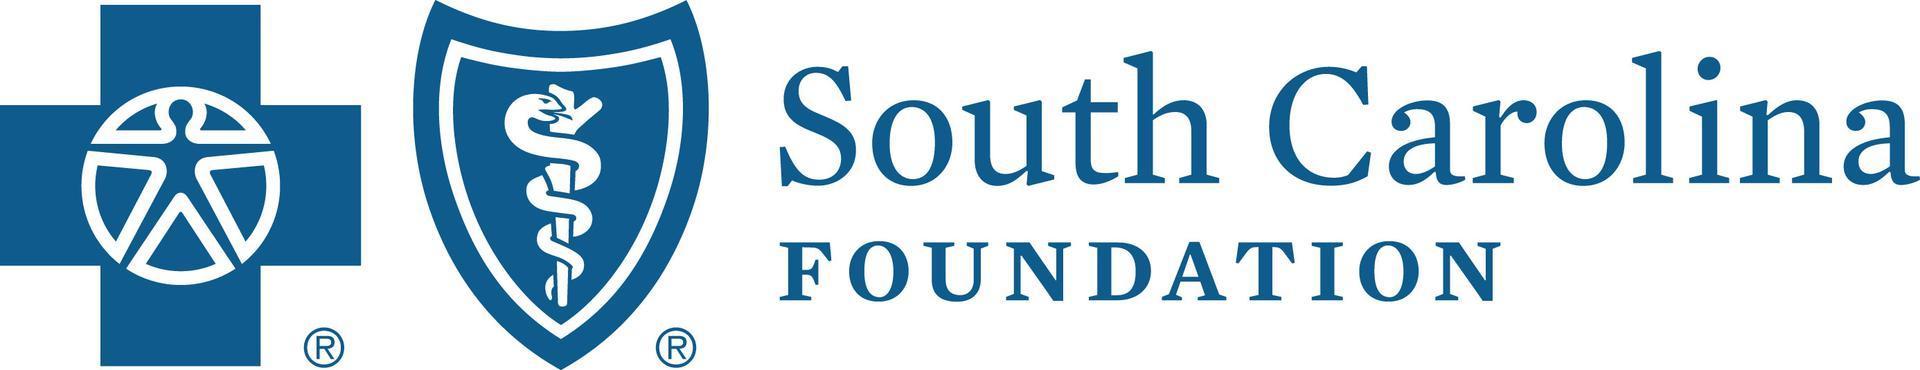 Logos of the BlueCross BlueShield of South Carolina Foundation